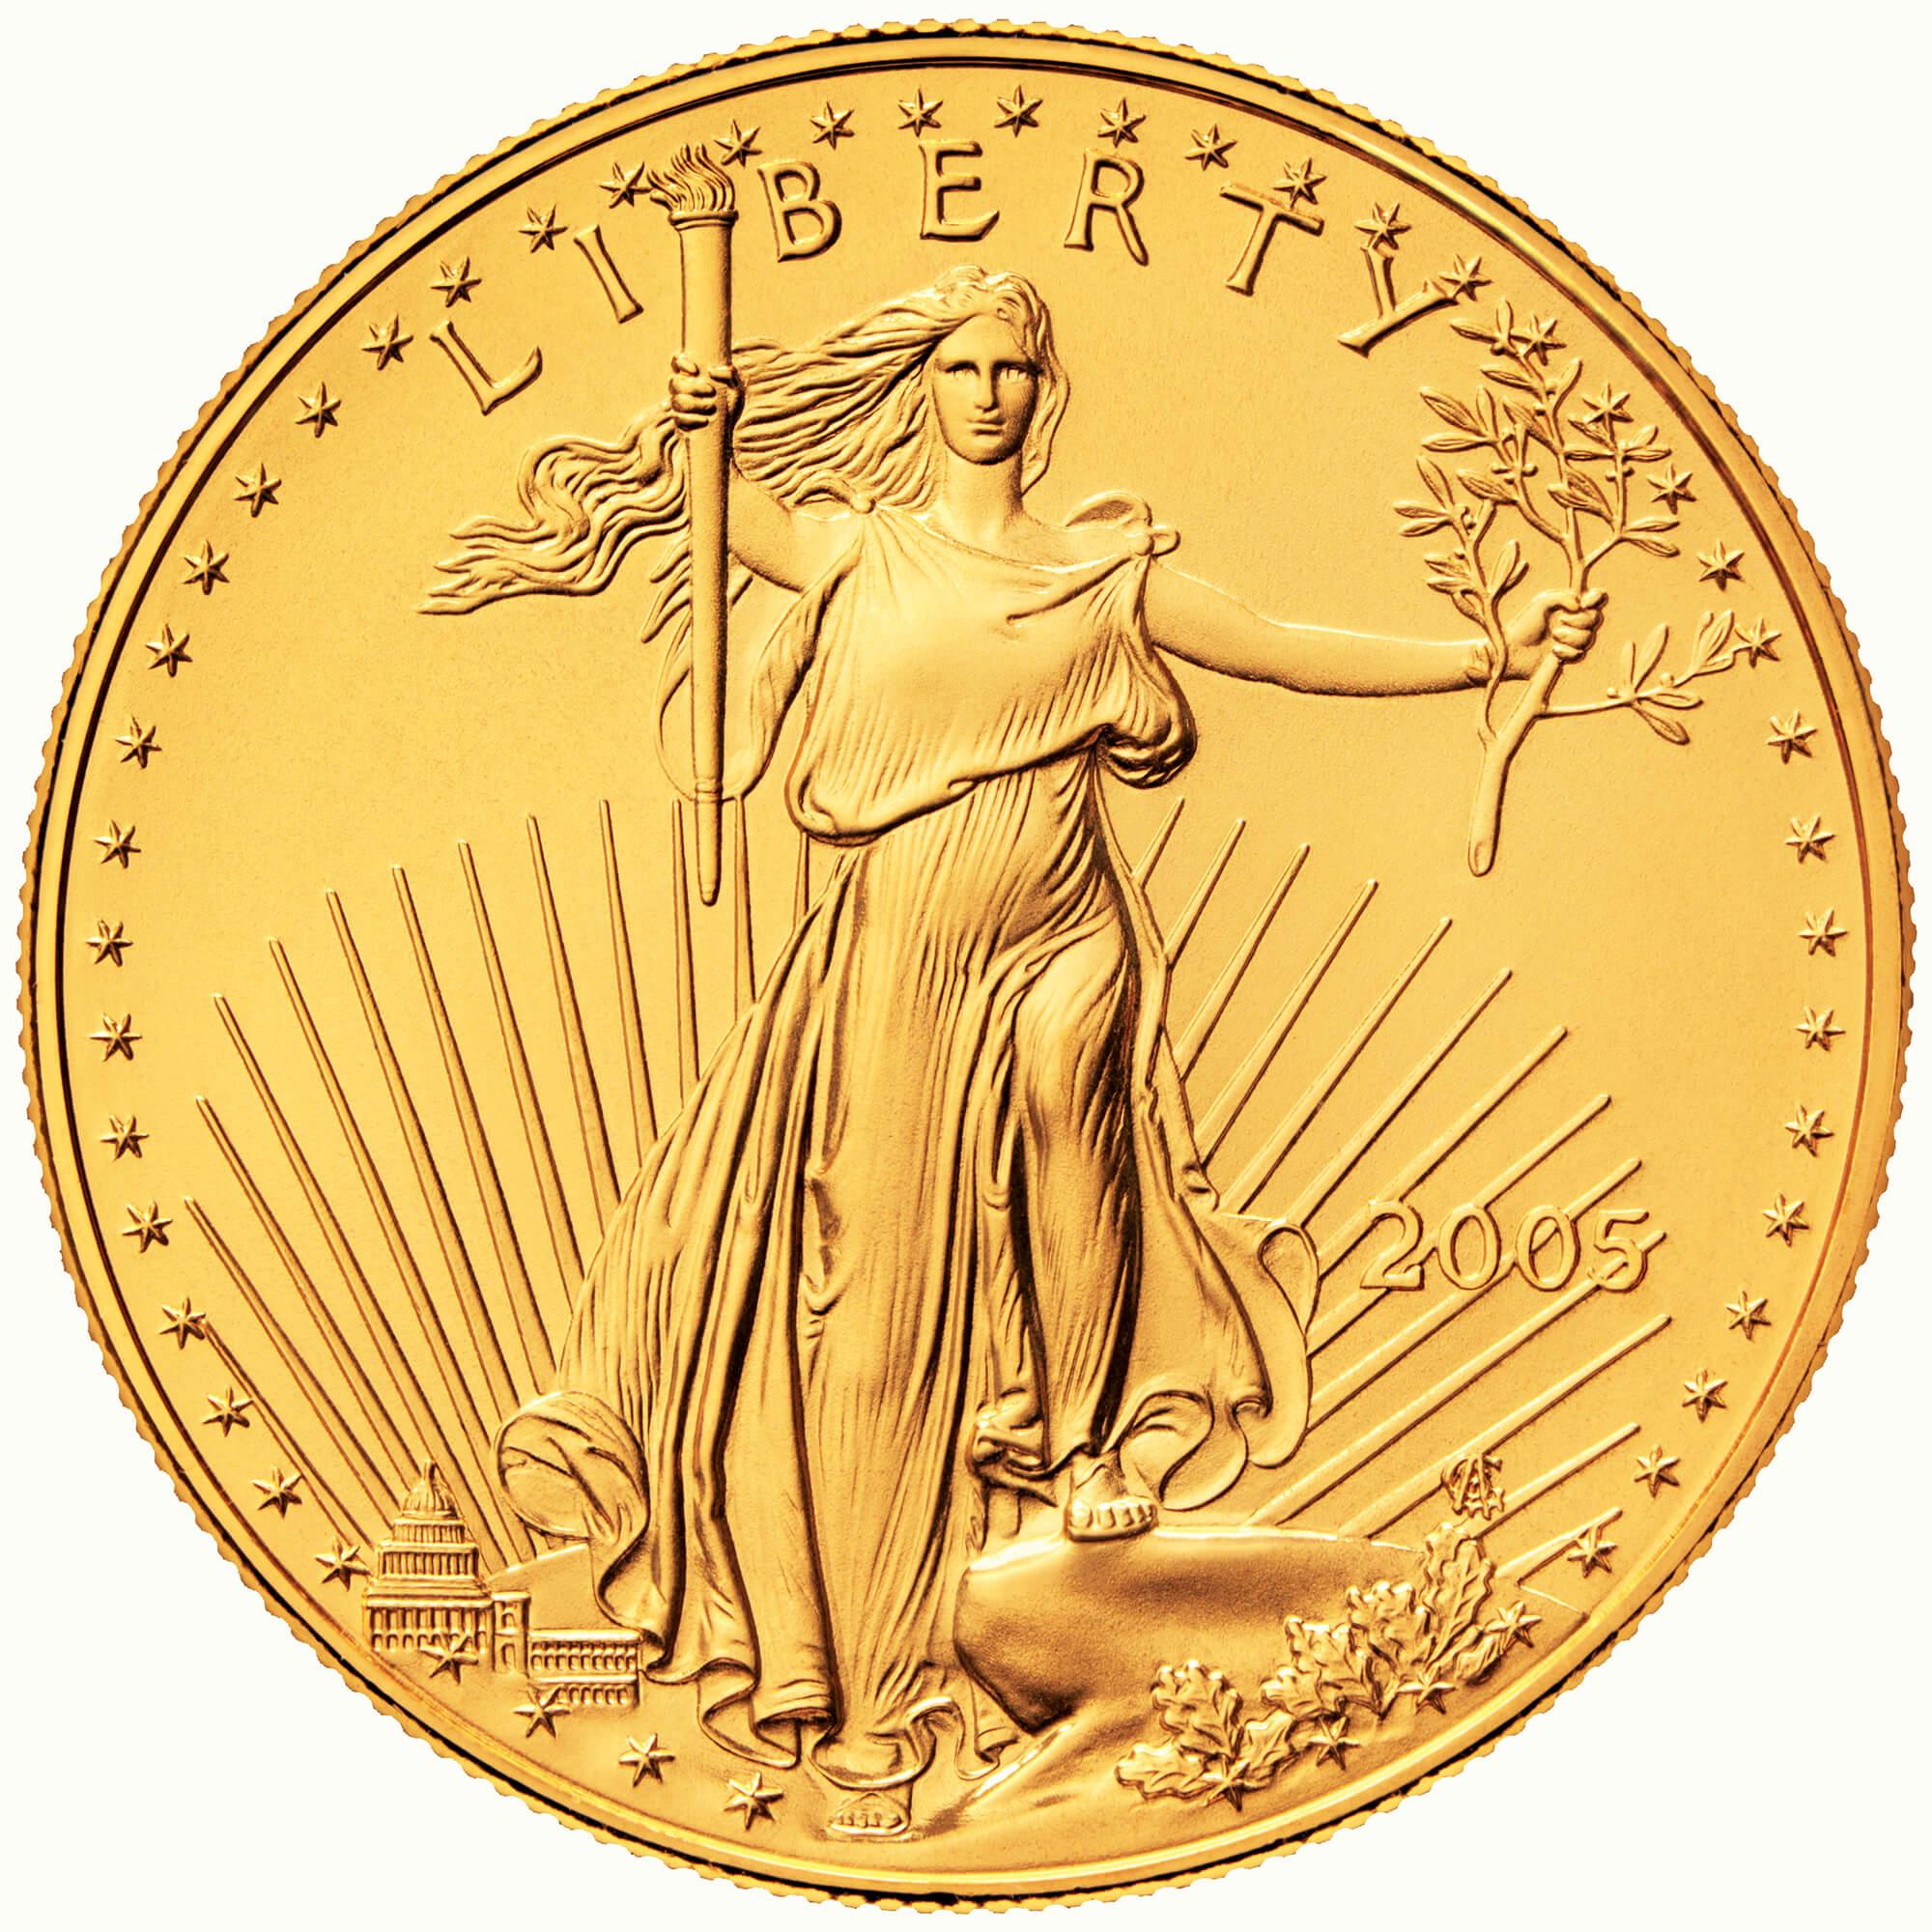 US 5 Dollars 2008 no mintmark